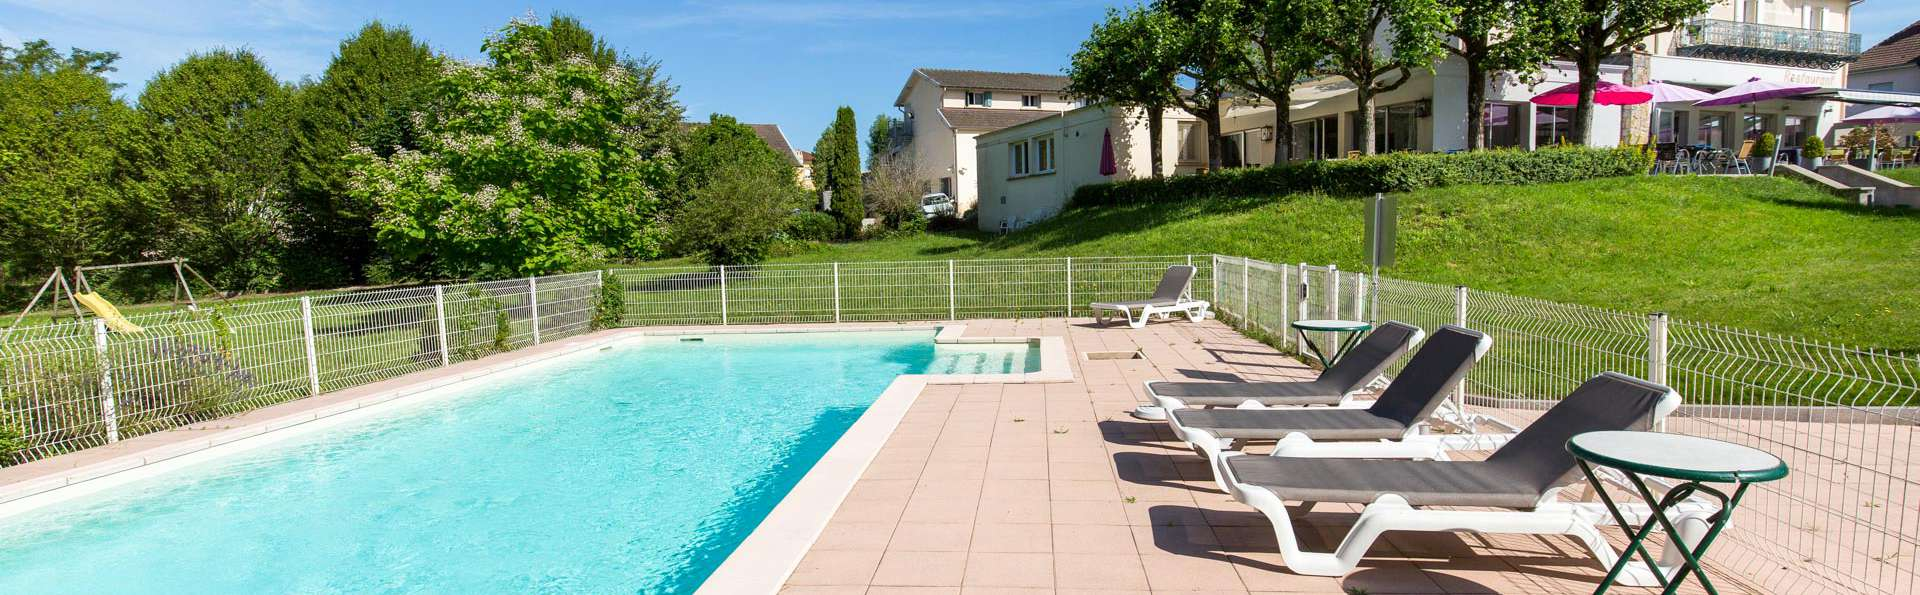 Hôtel Beau Site - Luxeuil-les-Bains - EDIT_NEW_POOL_03.jpg